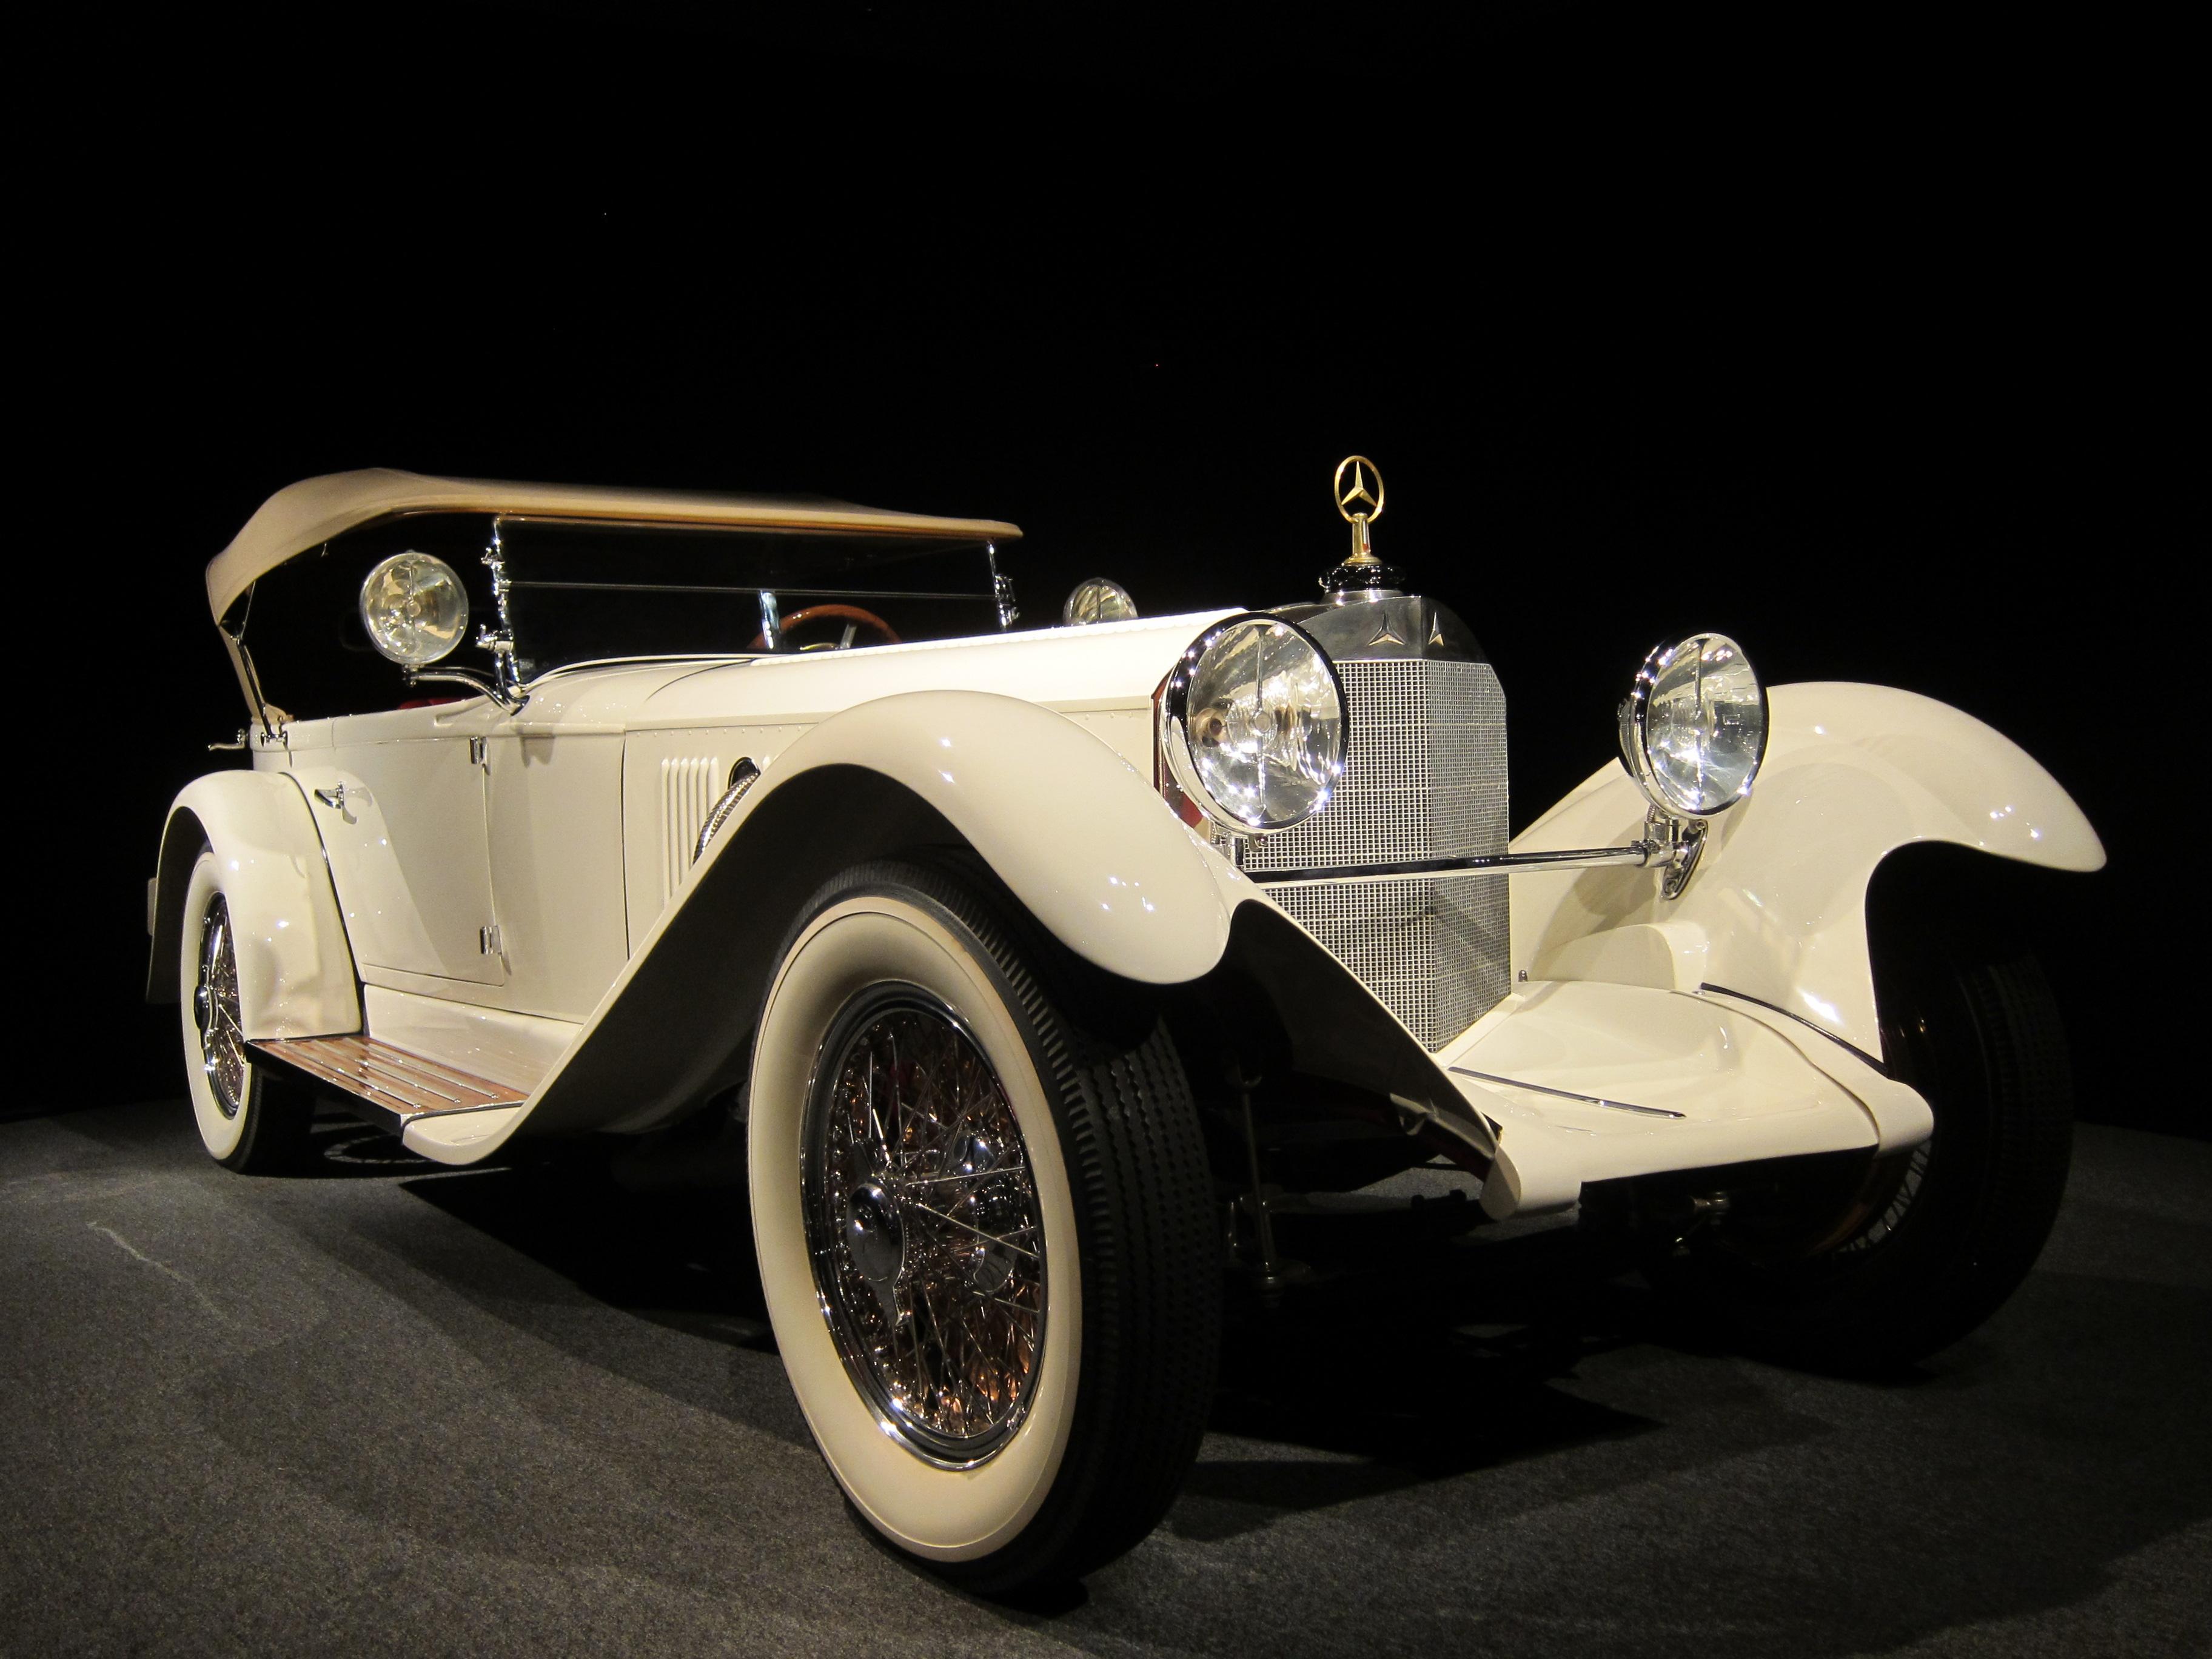 Mercedes_Benz_1928_Model_S_Tourer_at_Bla